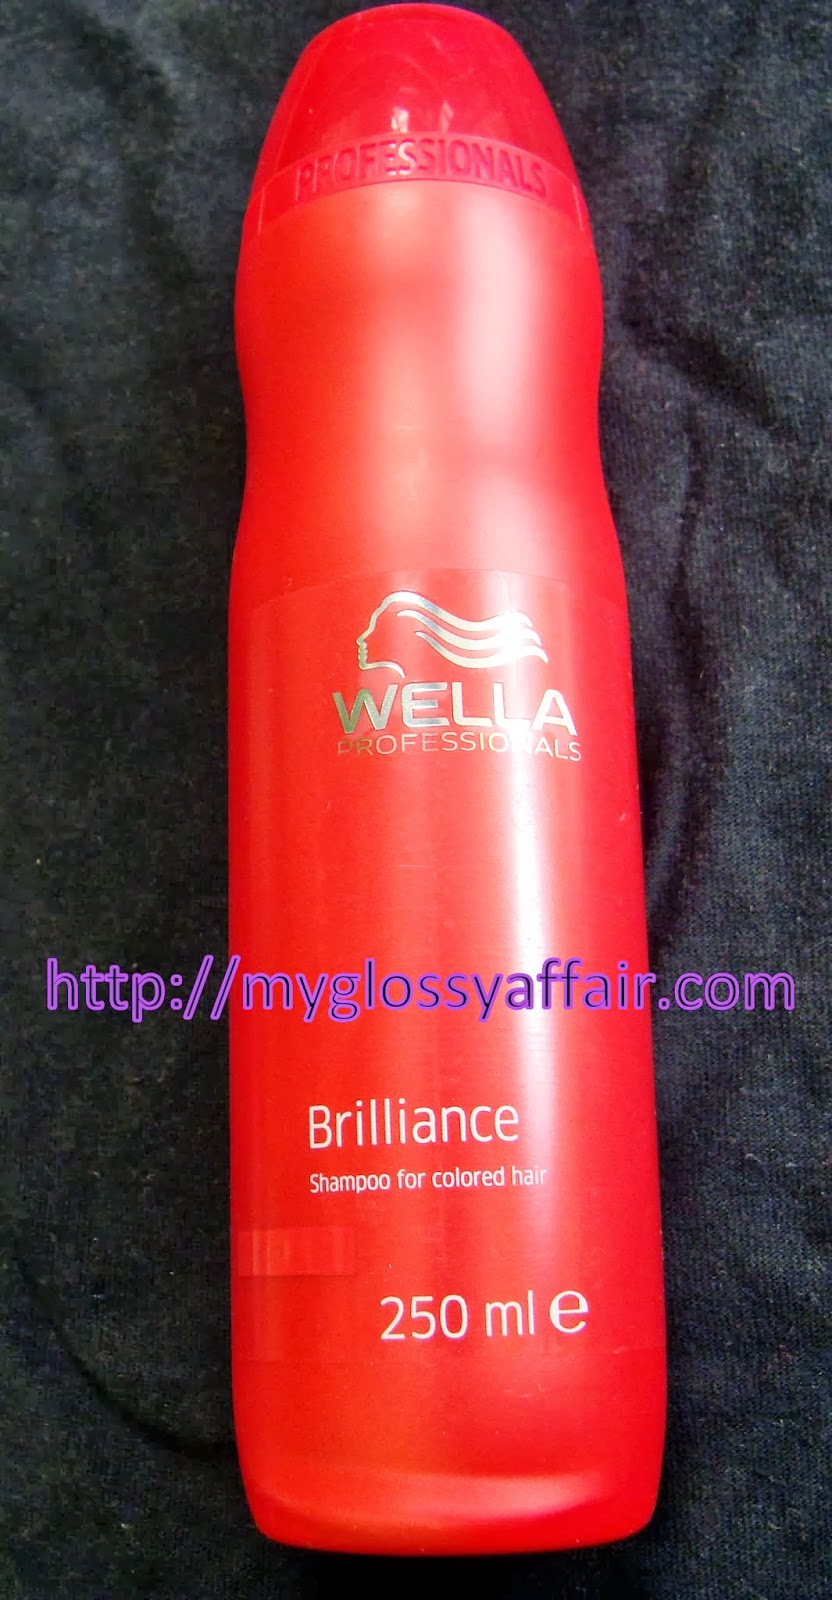 Wella Professionals Brilliance Shampoo For Coloured Hair Review Parfum Putri